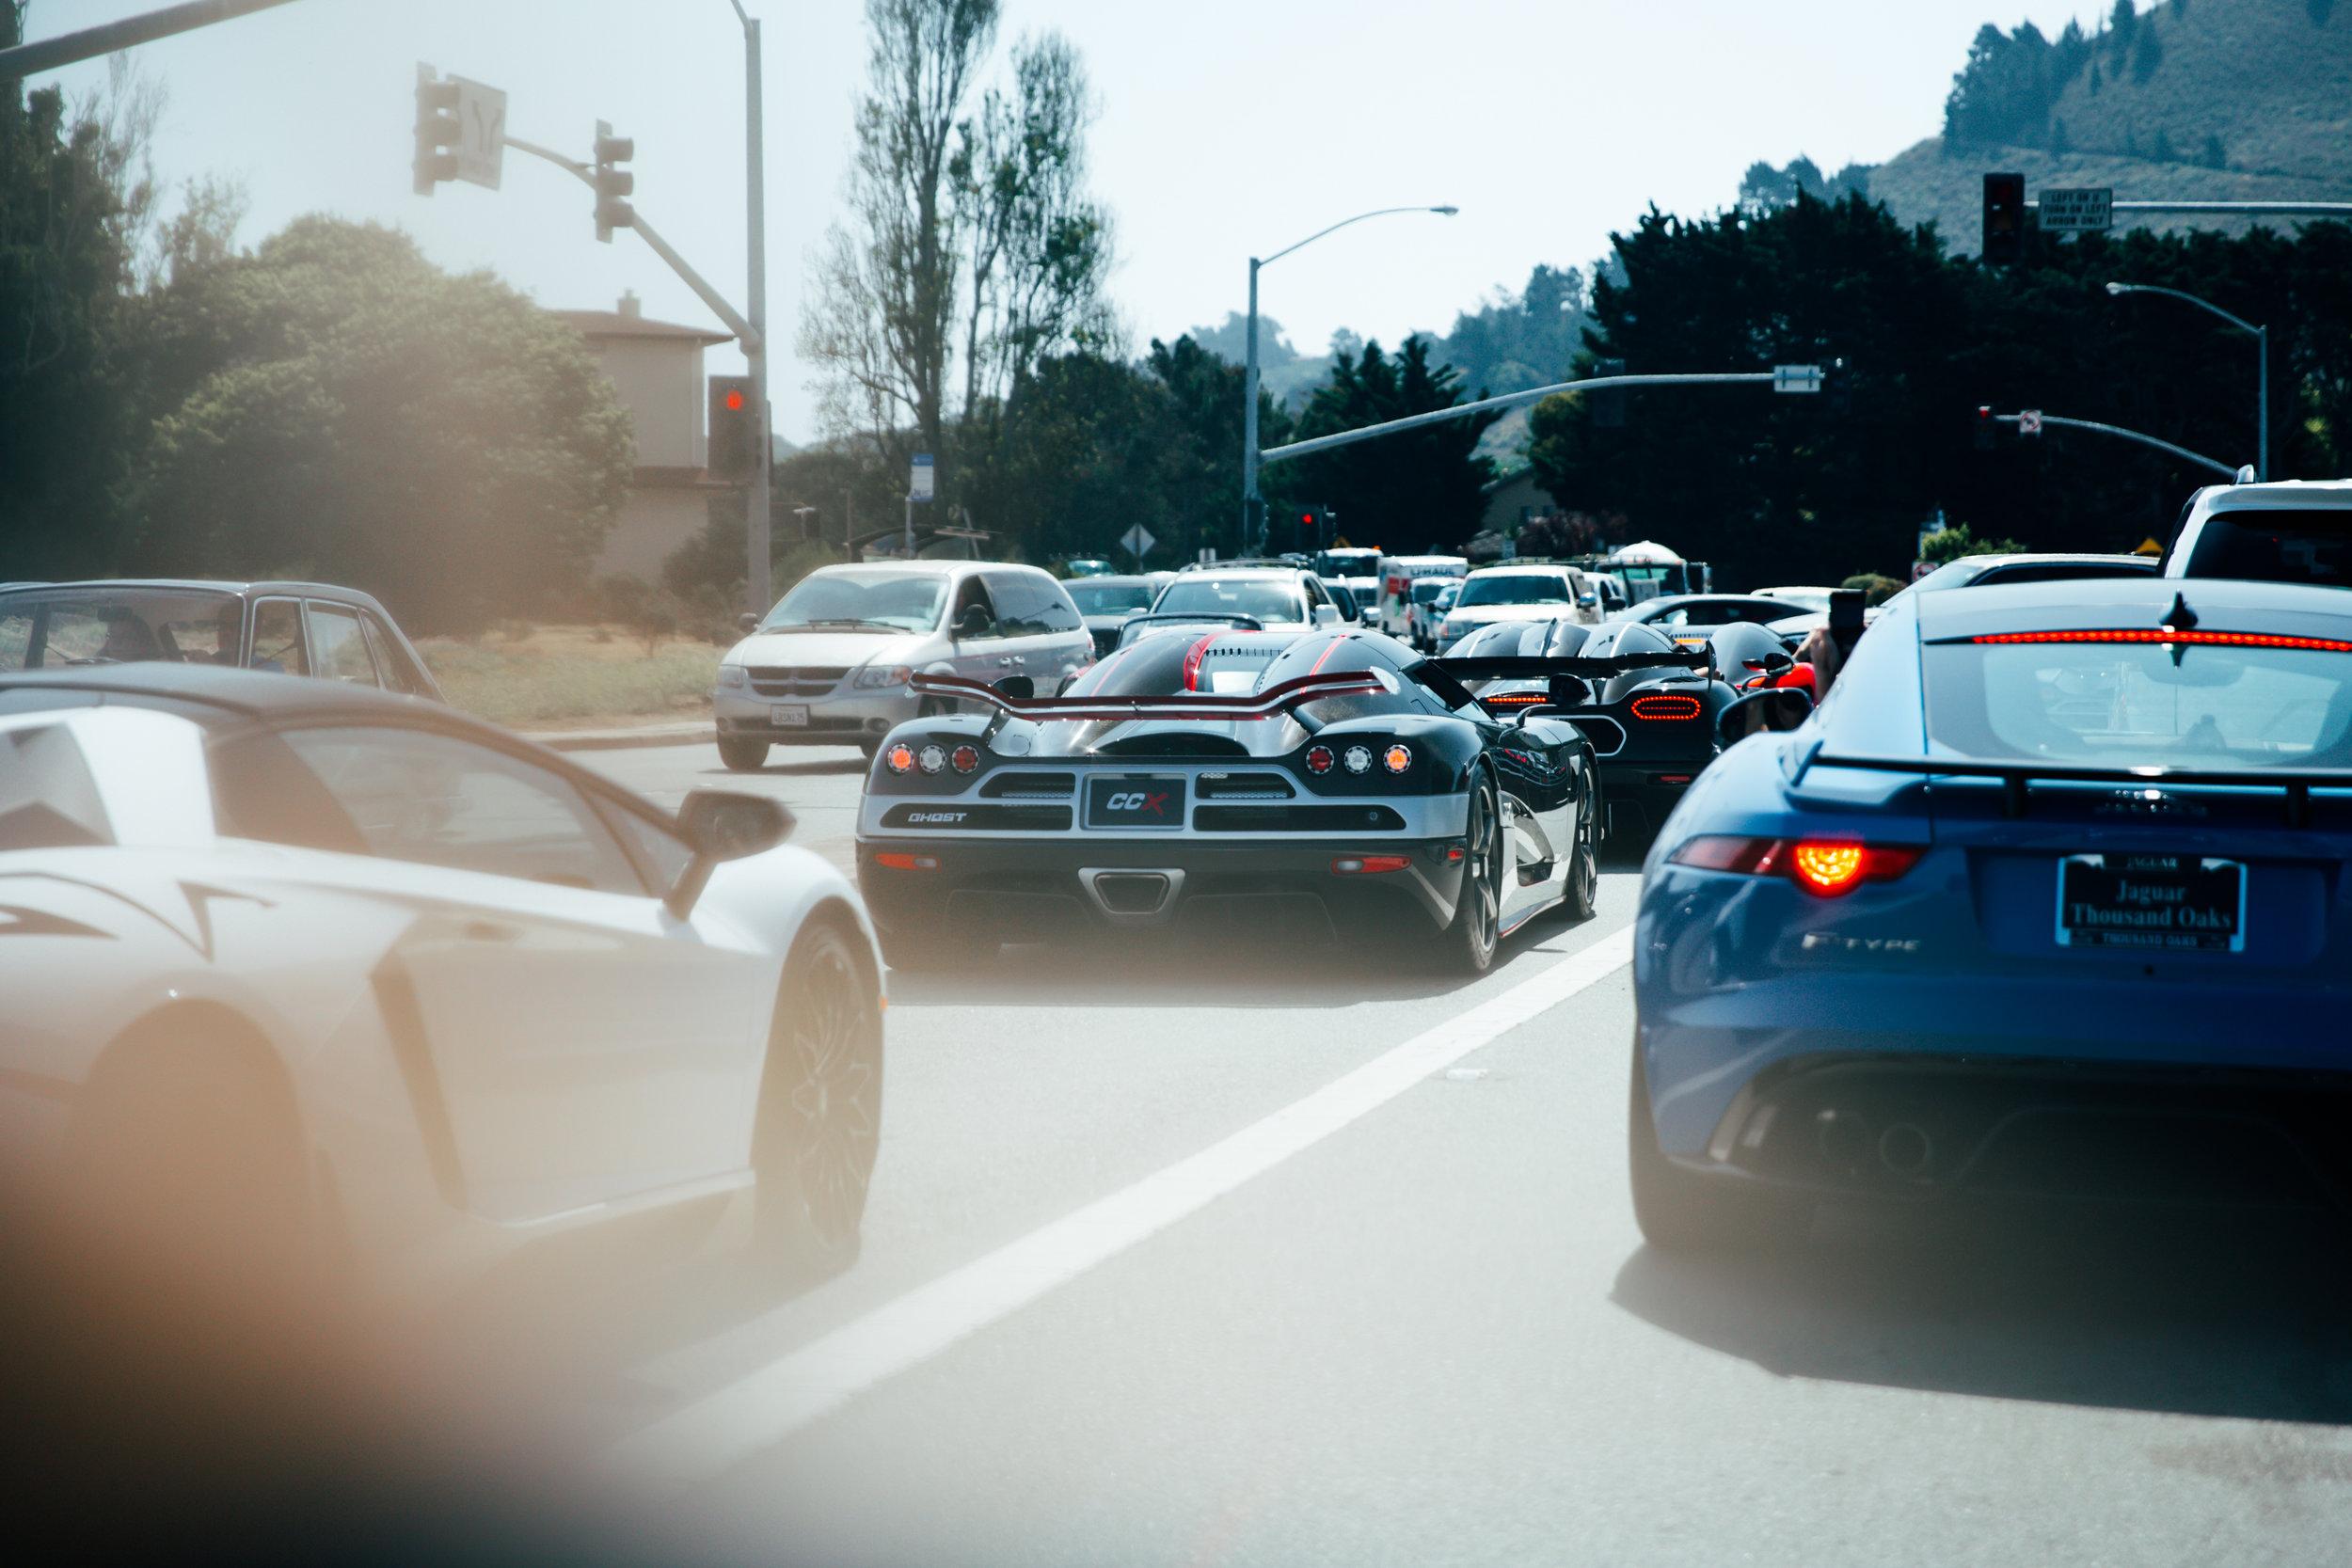 Stay_Driven_Monterey_Car_Week_Koenigsegg-54.jpg